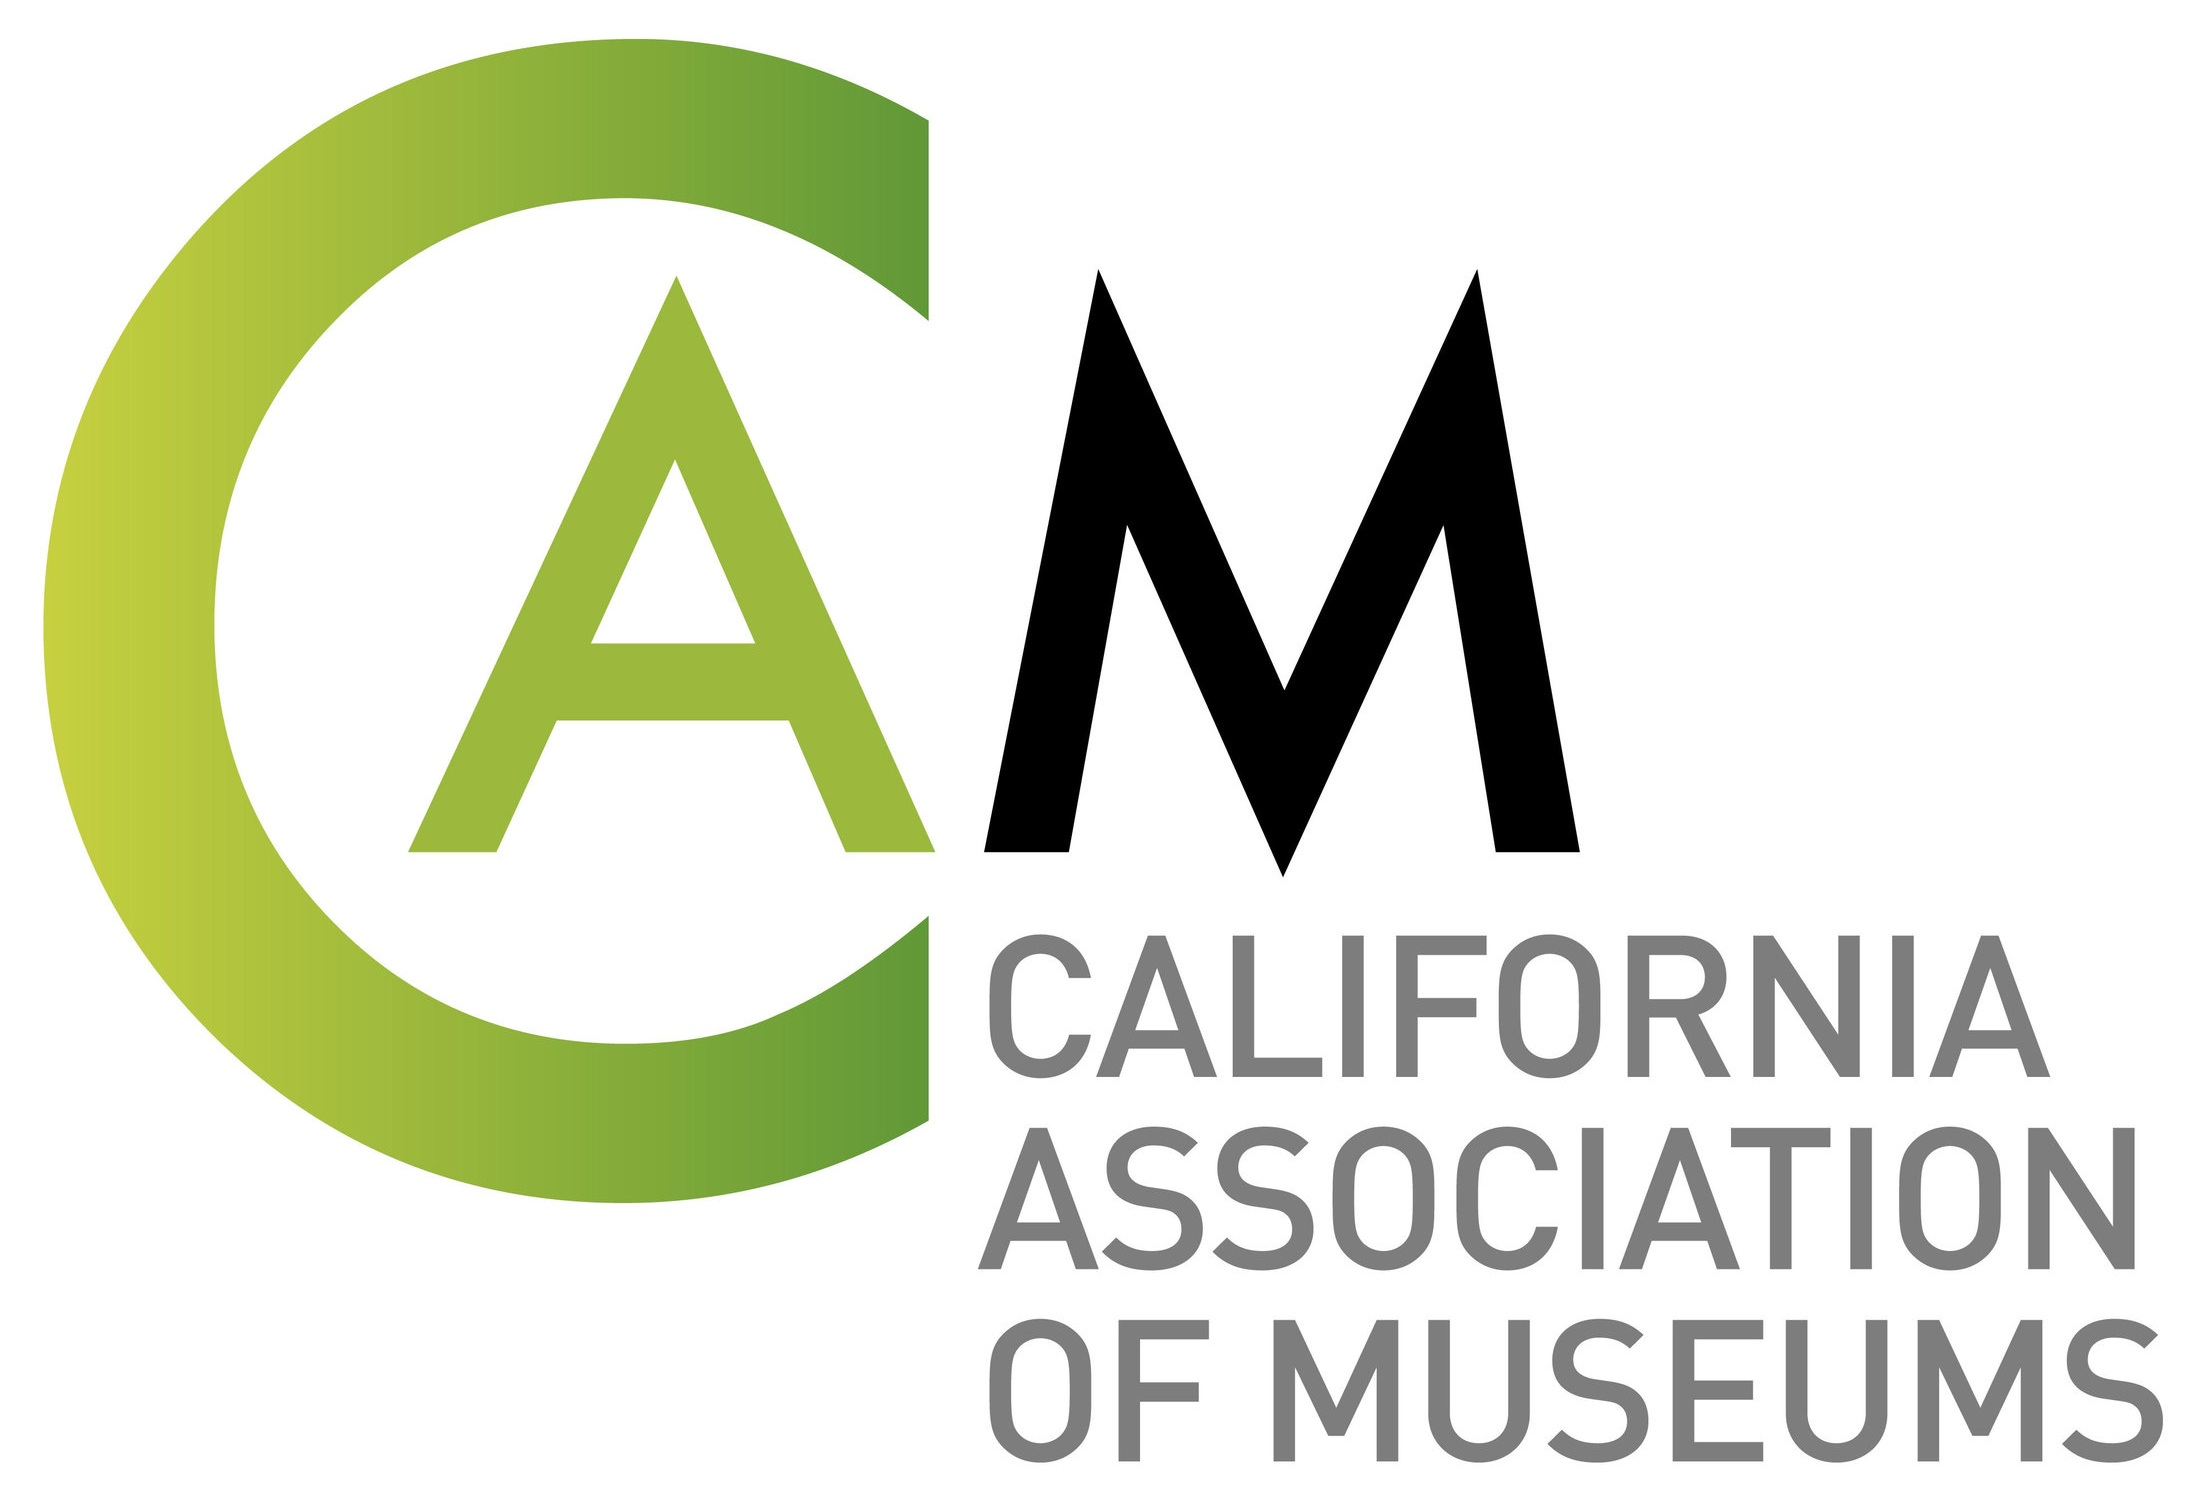 California+Association+of+Museums++Logo.jpg